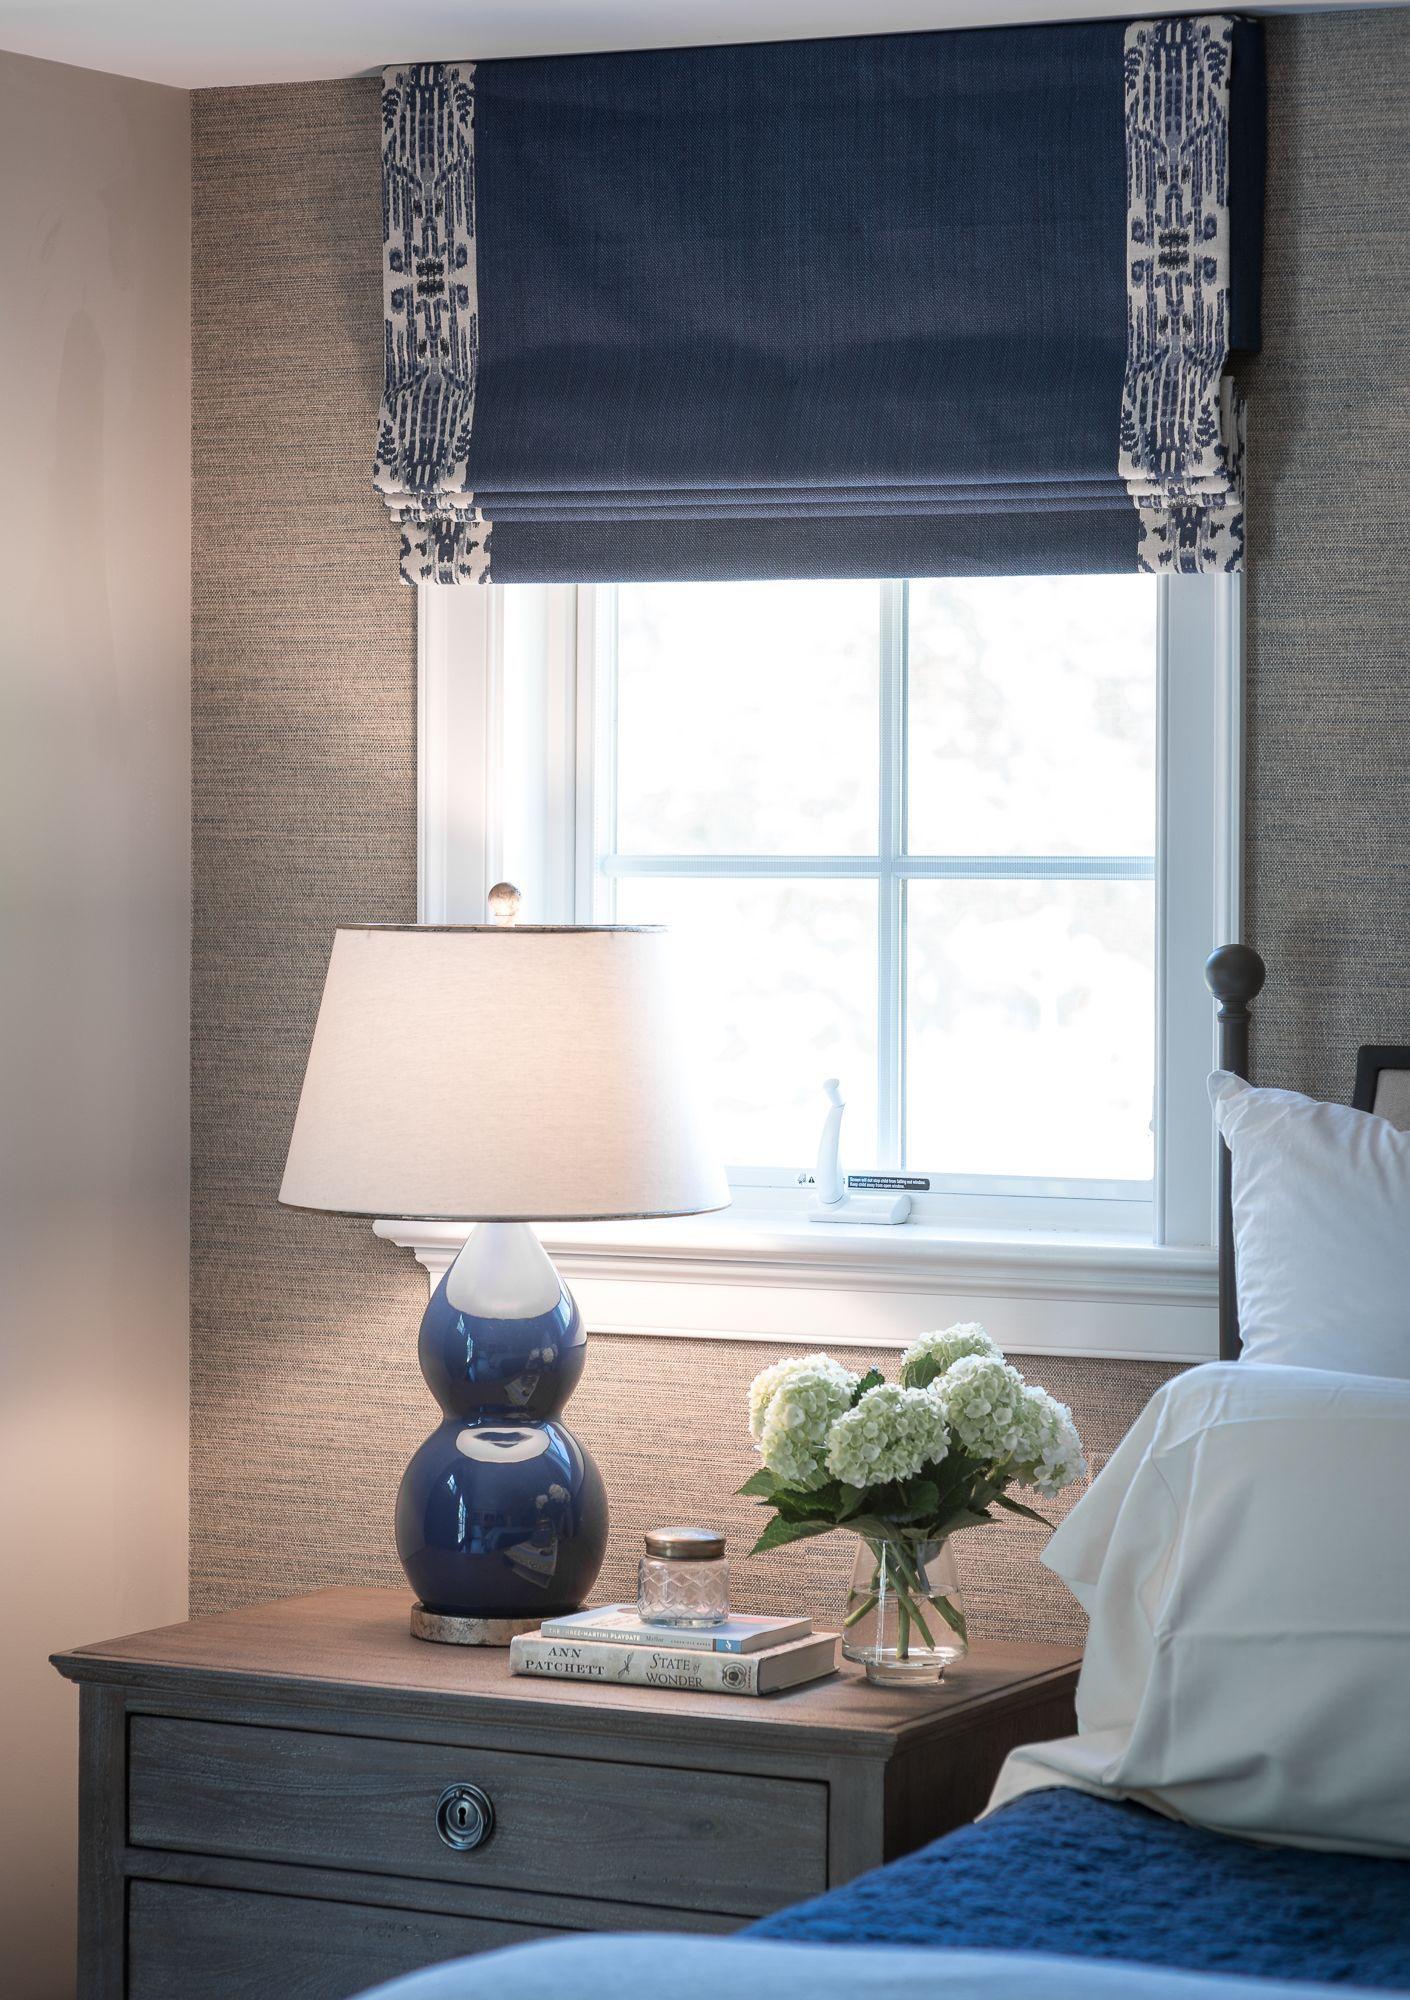 Furniture, Home Decor, Tools, Office Furniture, Bedding, Lighting